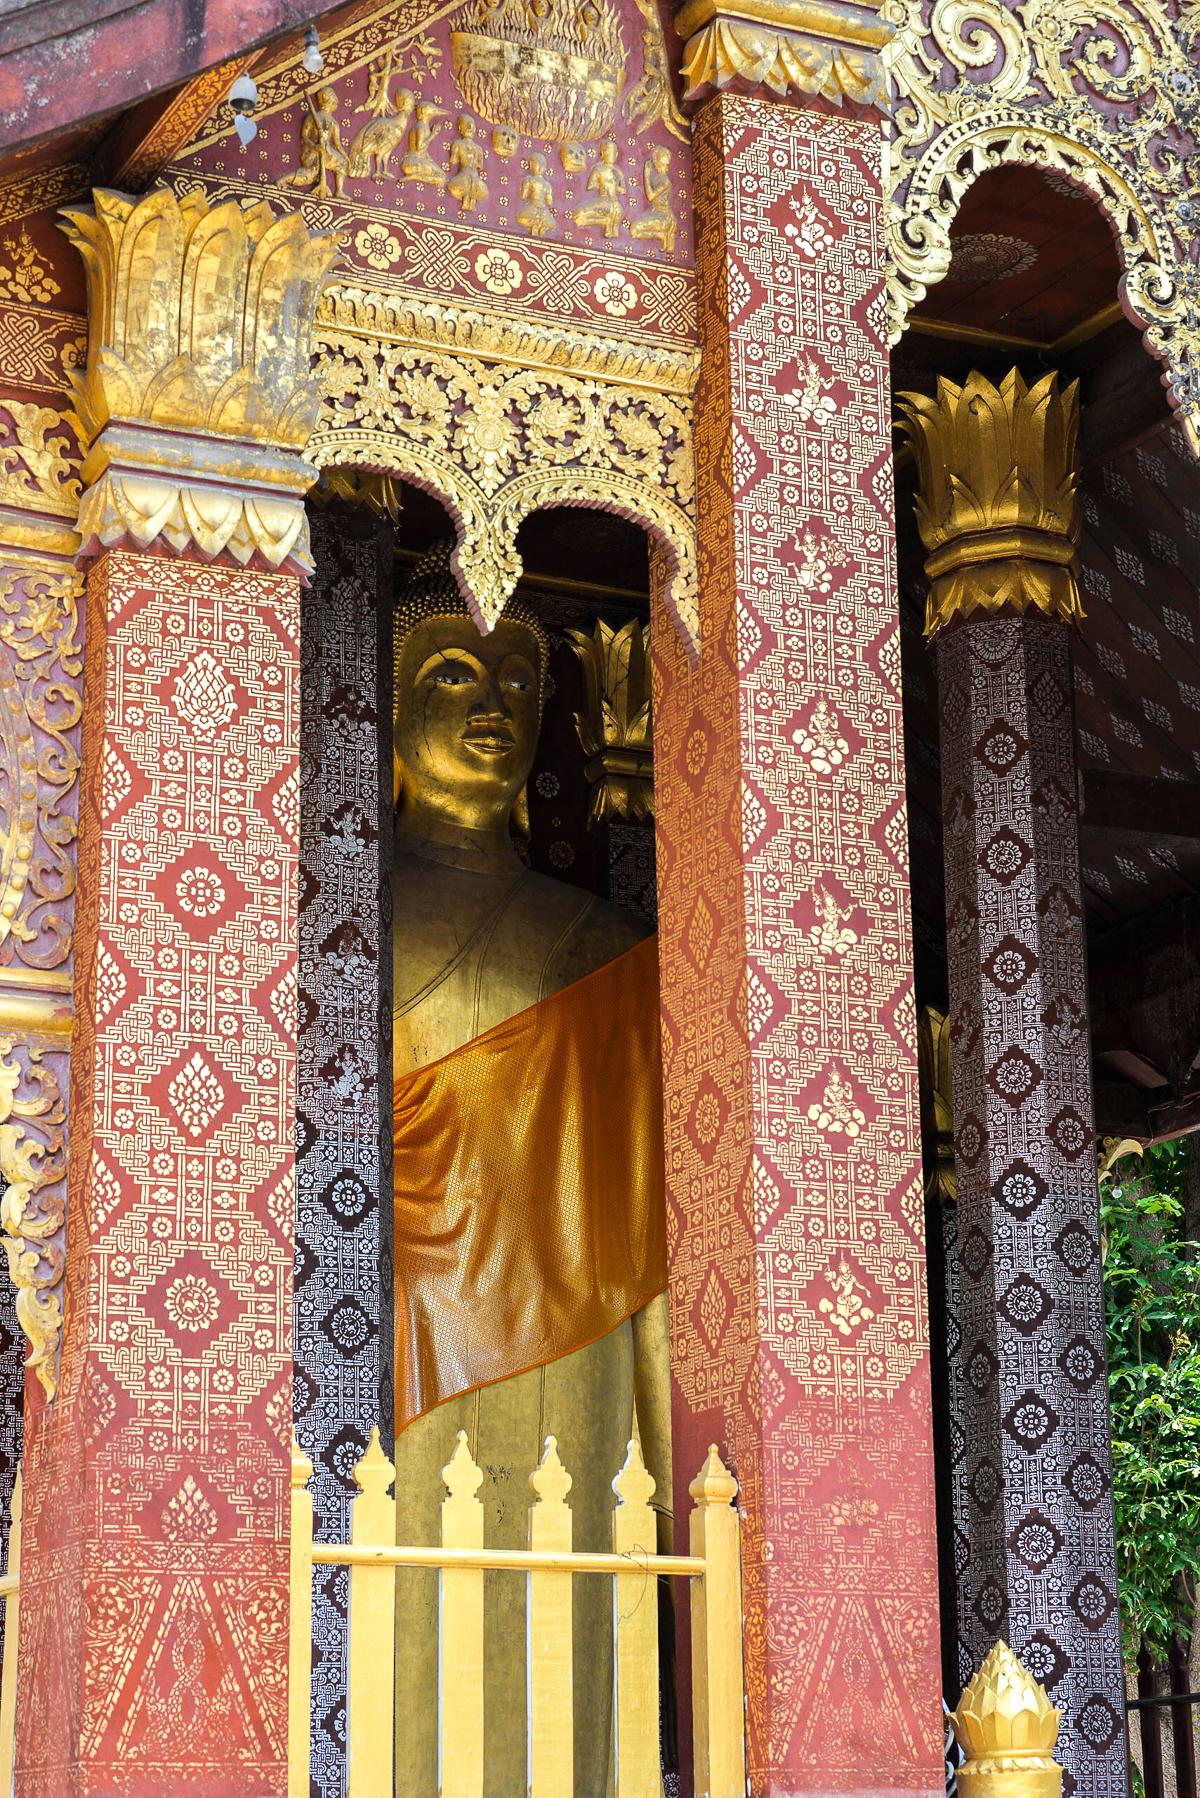 Stacie Flinner 3 Nagas Complete Guide to Luang Prabang-152.jpg